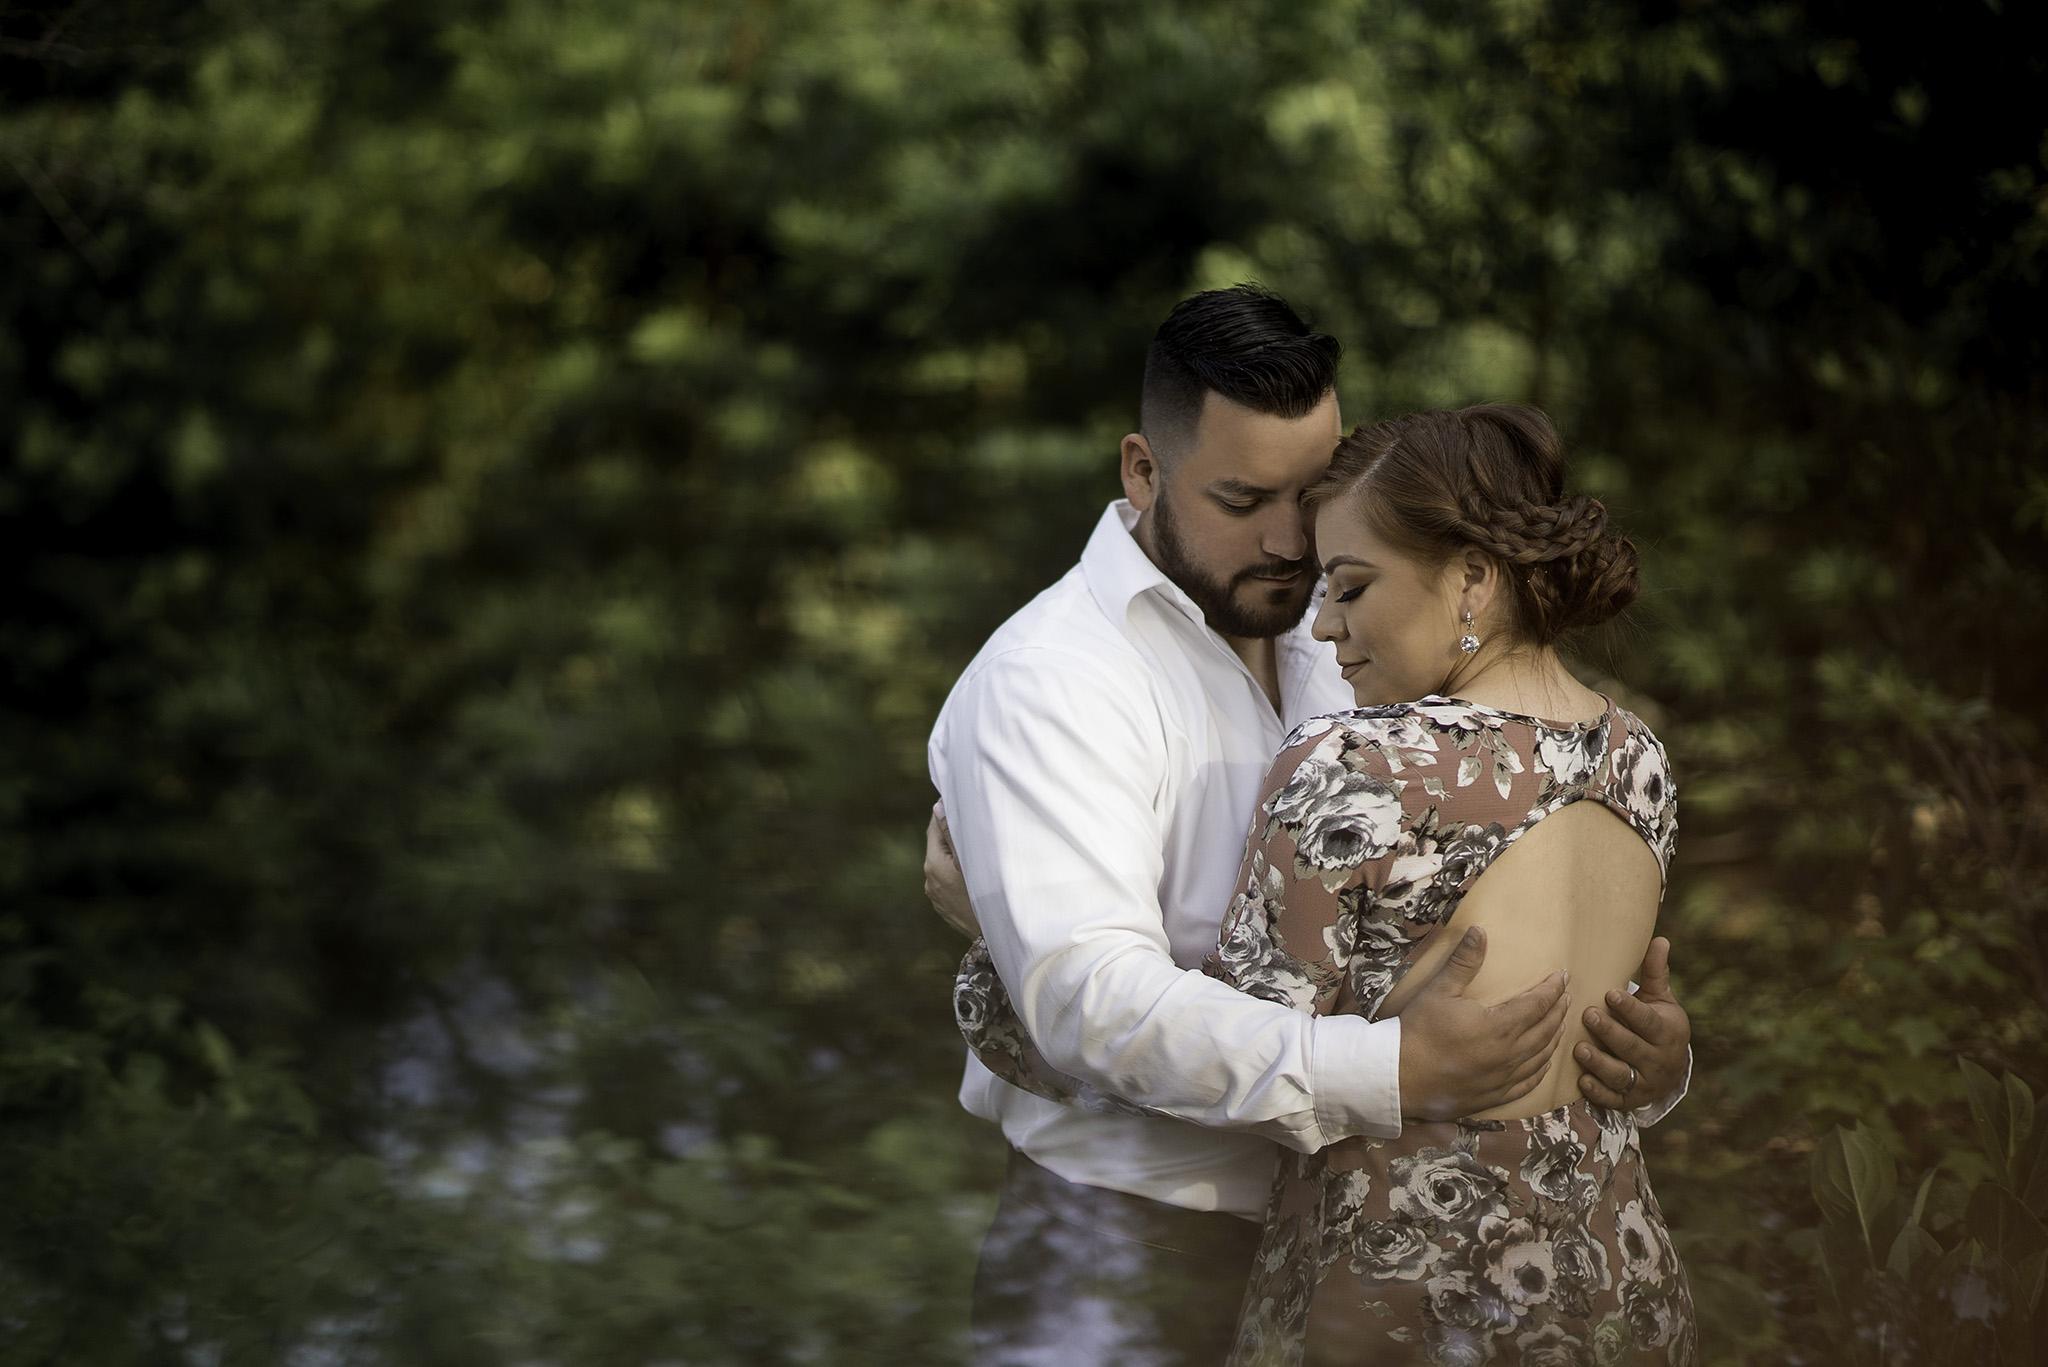 Houston-mercer-arboretum-engagement-photo-session